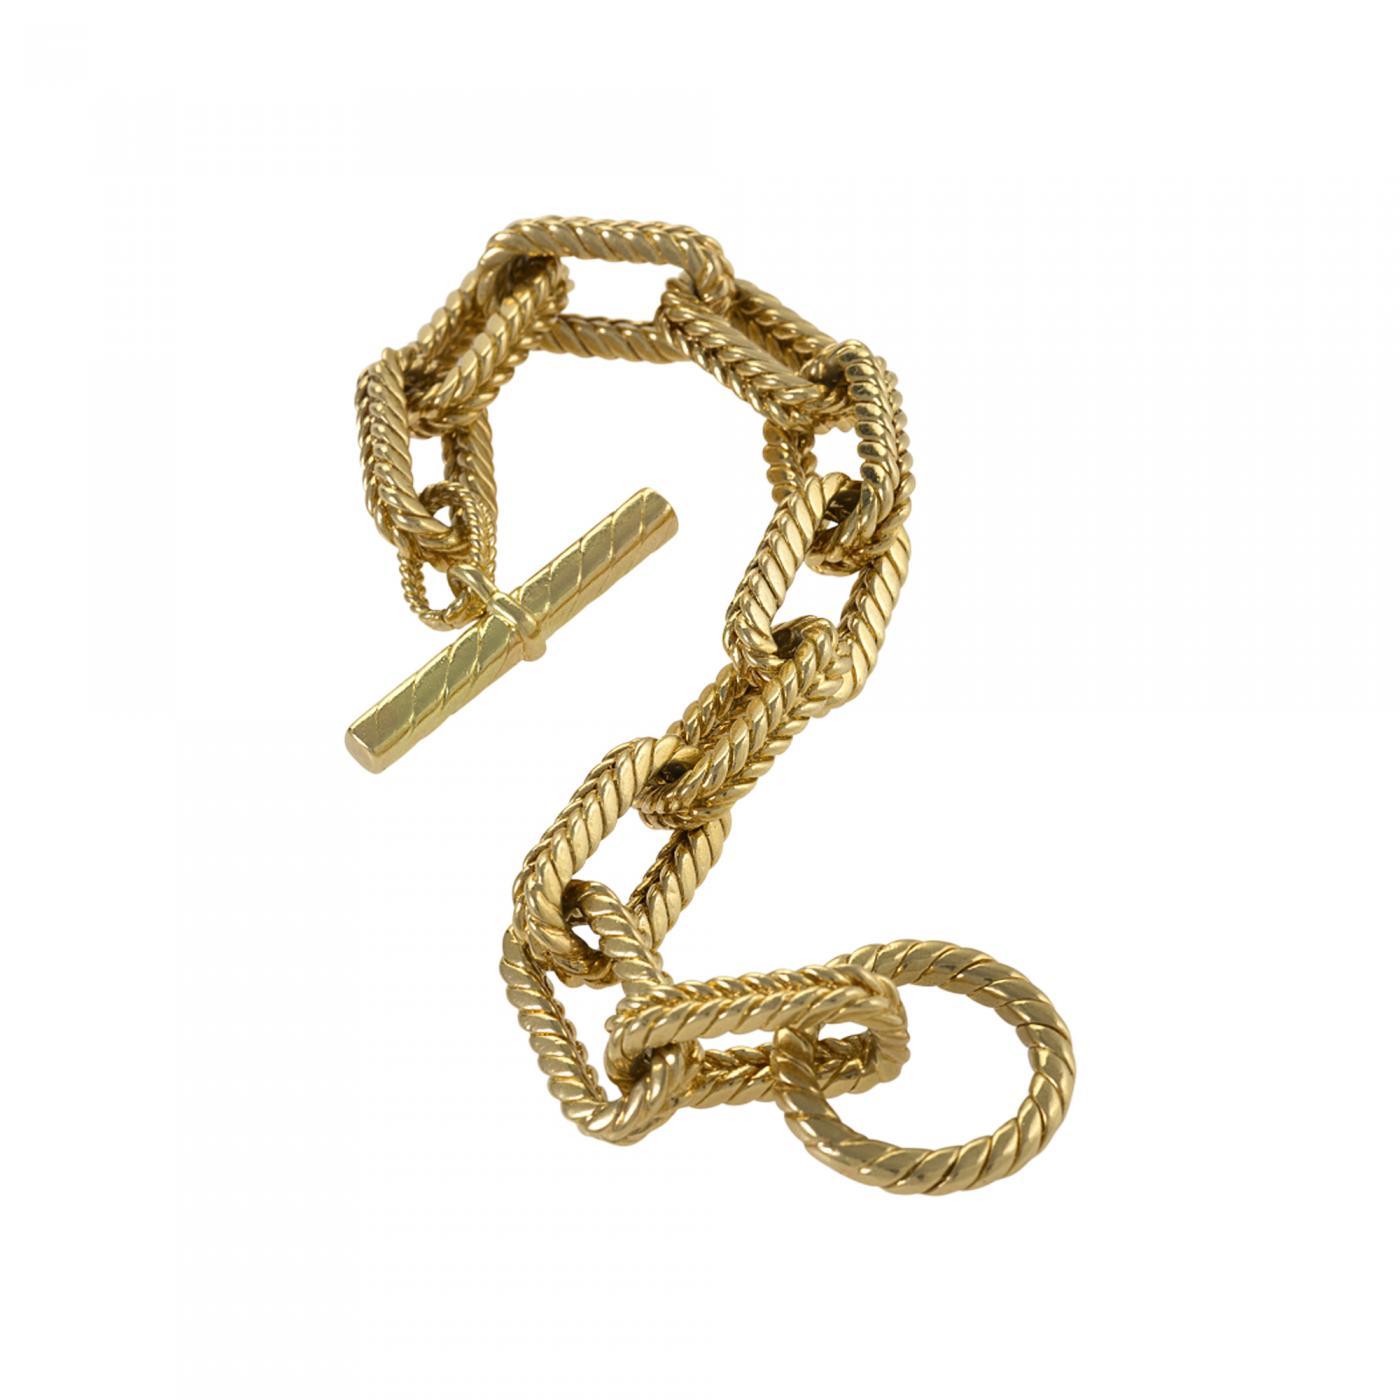 Tiffany and Co  - Tiffany & Co  Gold Link Bracelet